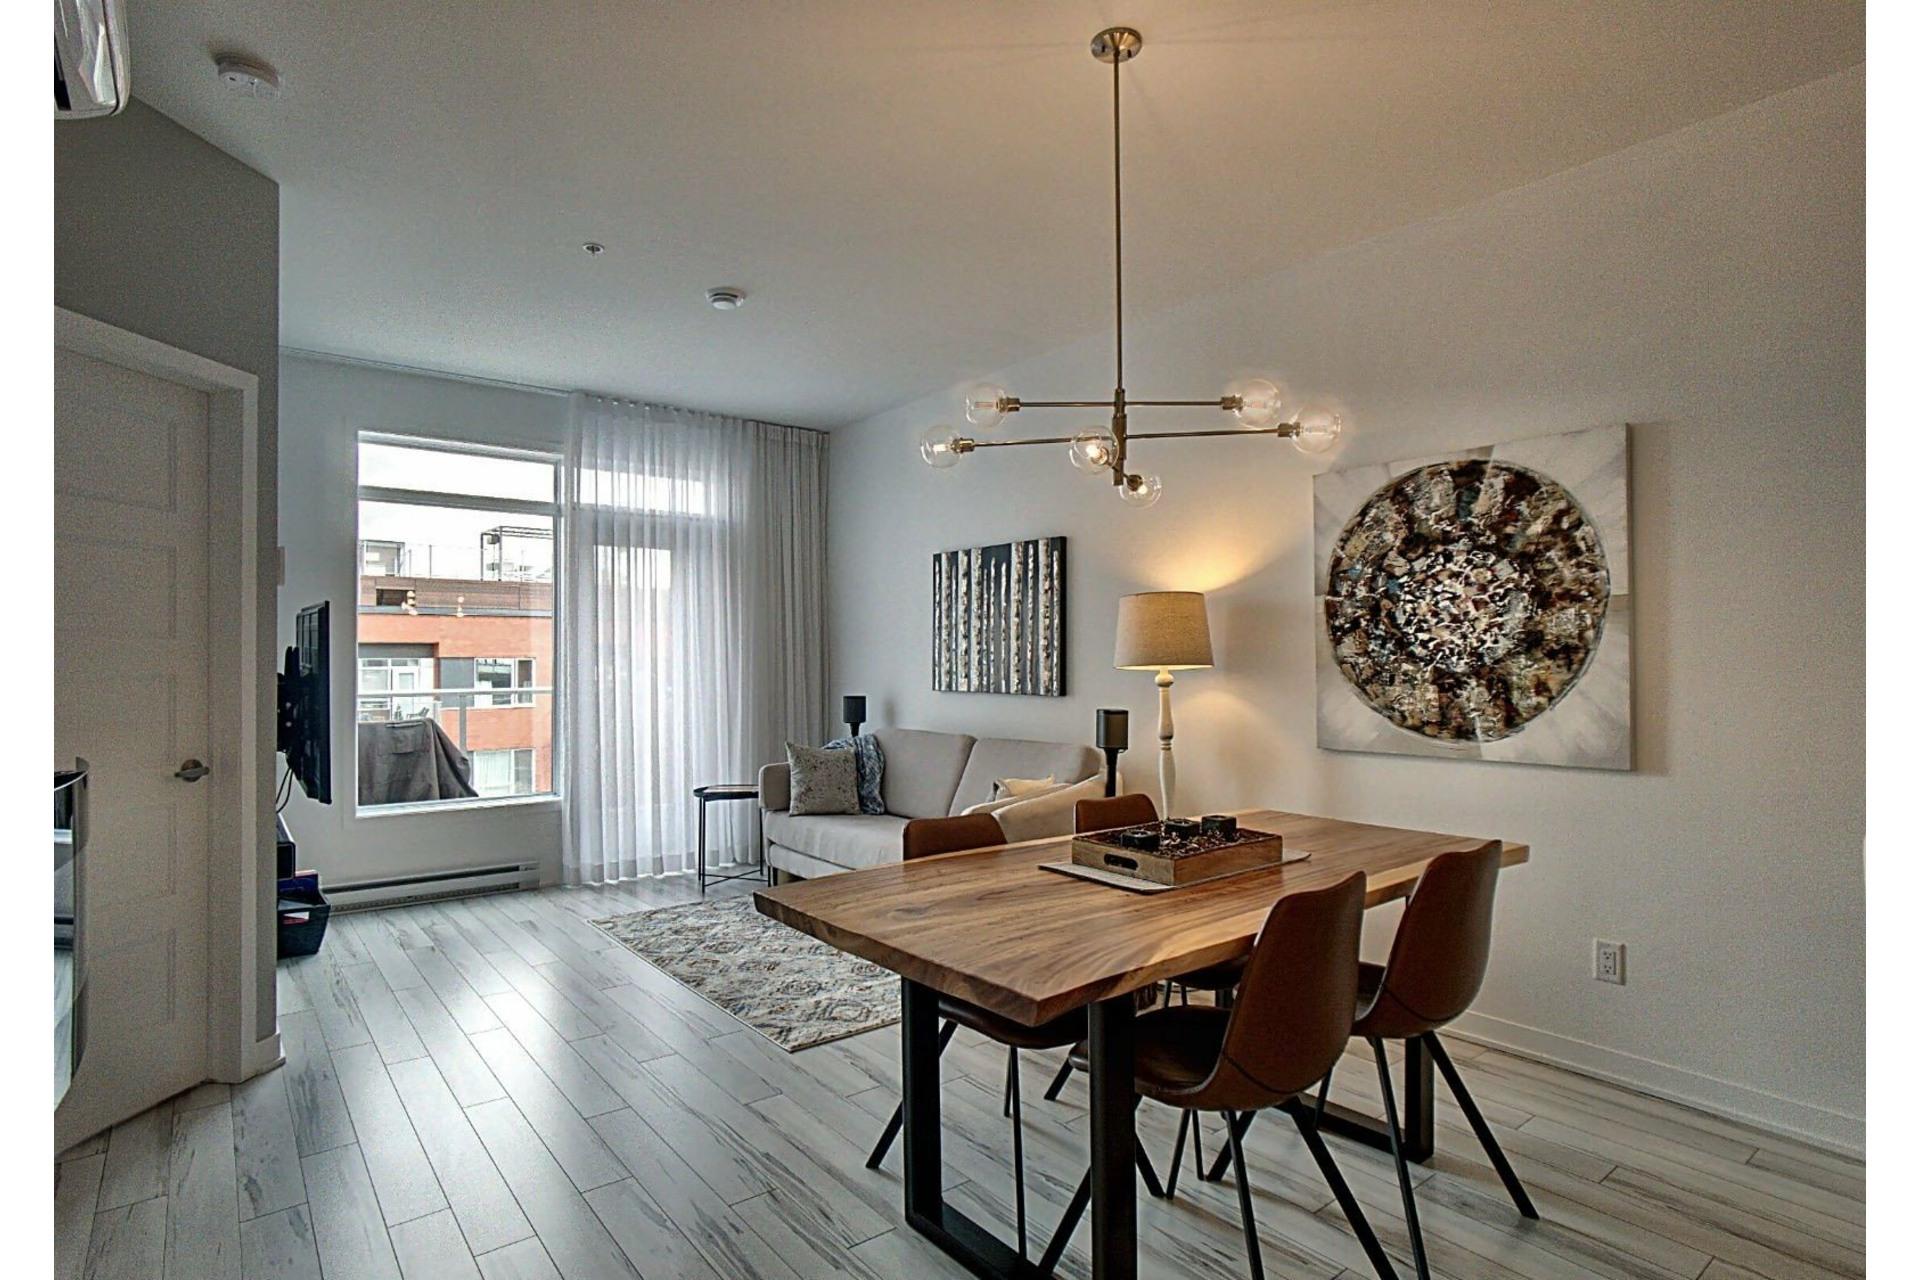 image 2 - Apartment For sale Saint-Lambert - 6 rooms